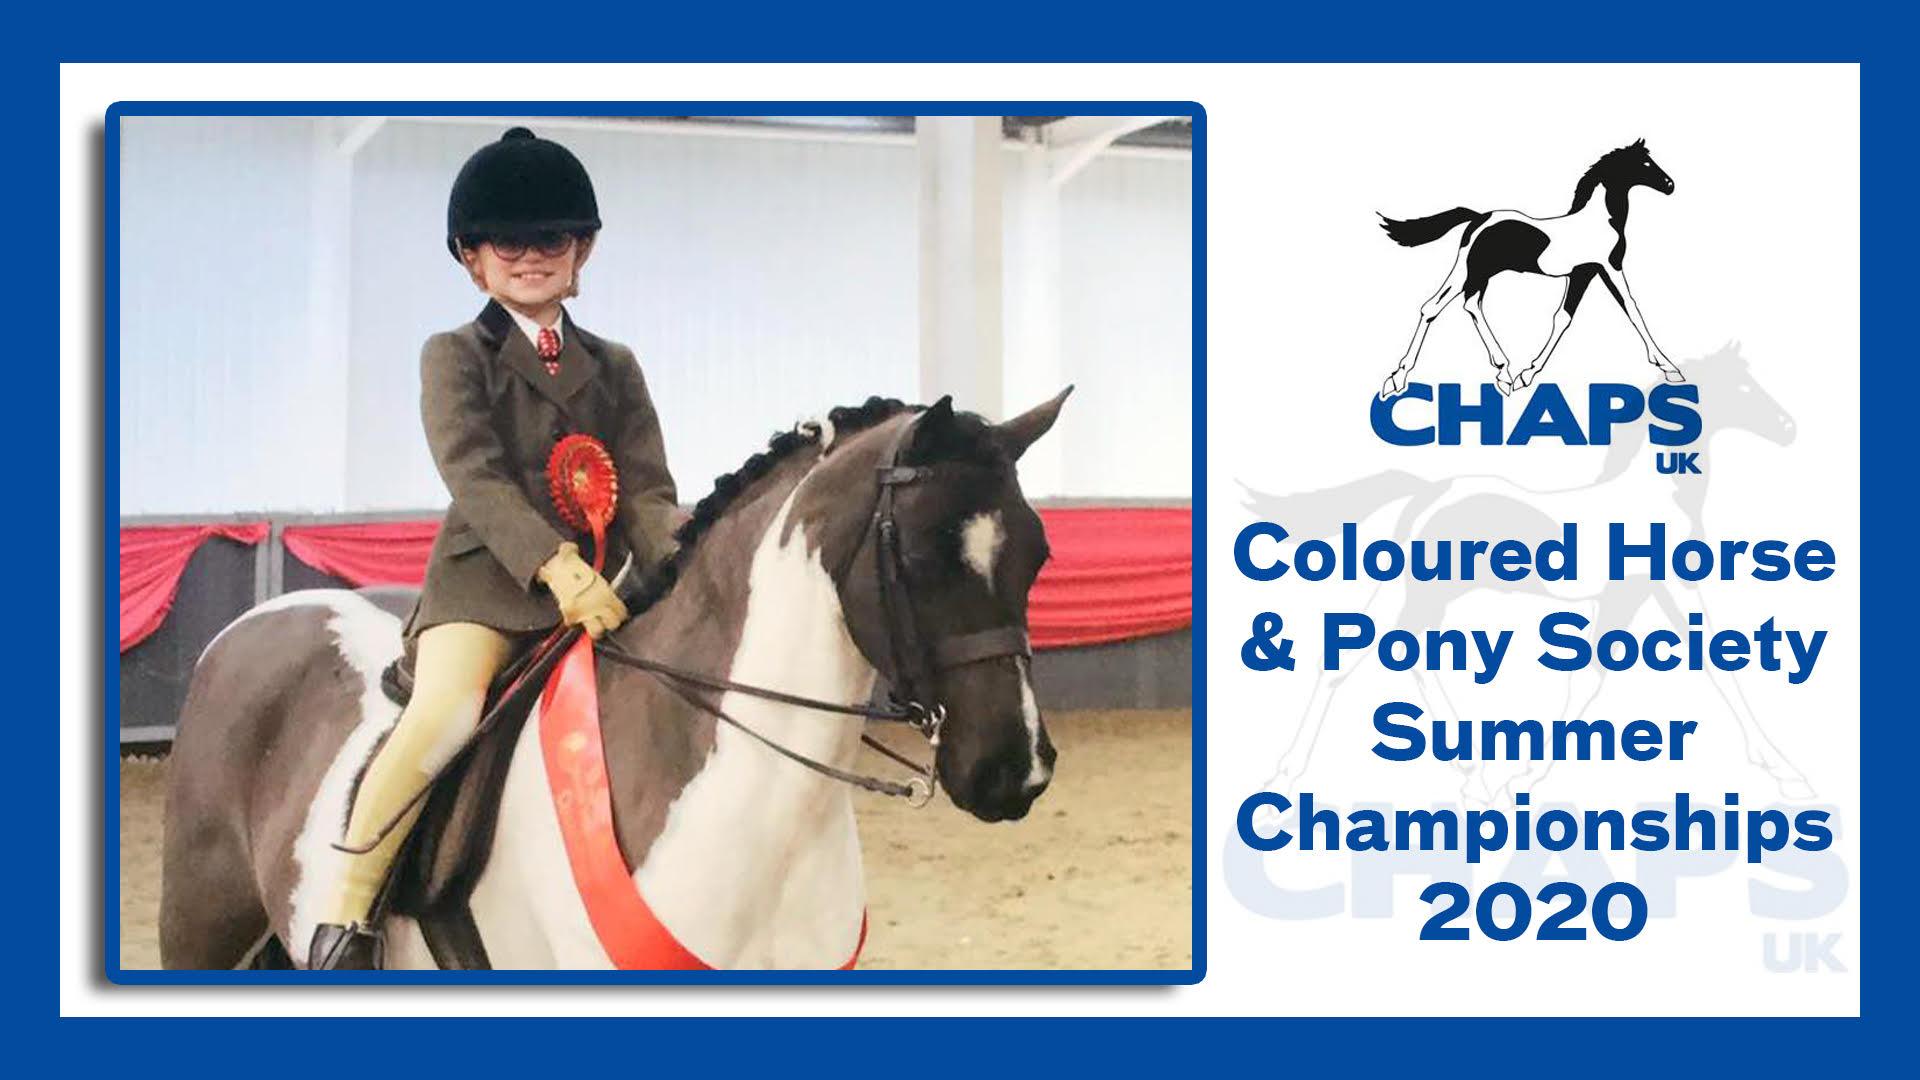 Coloured Horse & Pony Summer Championships 2020